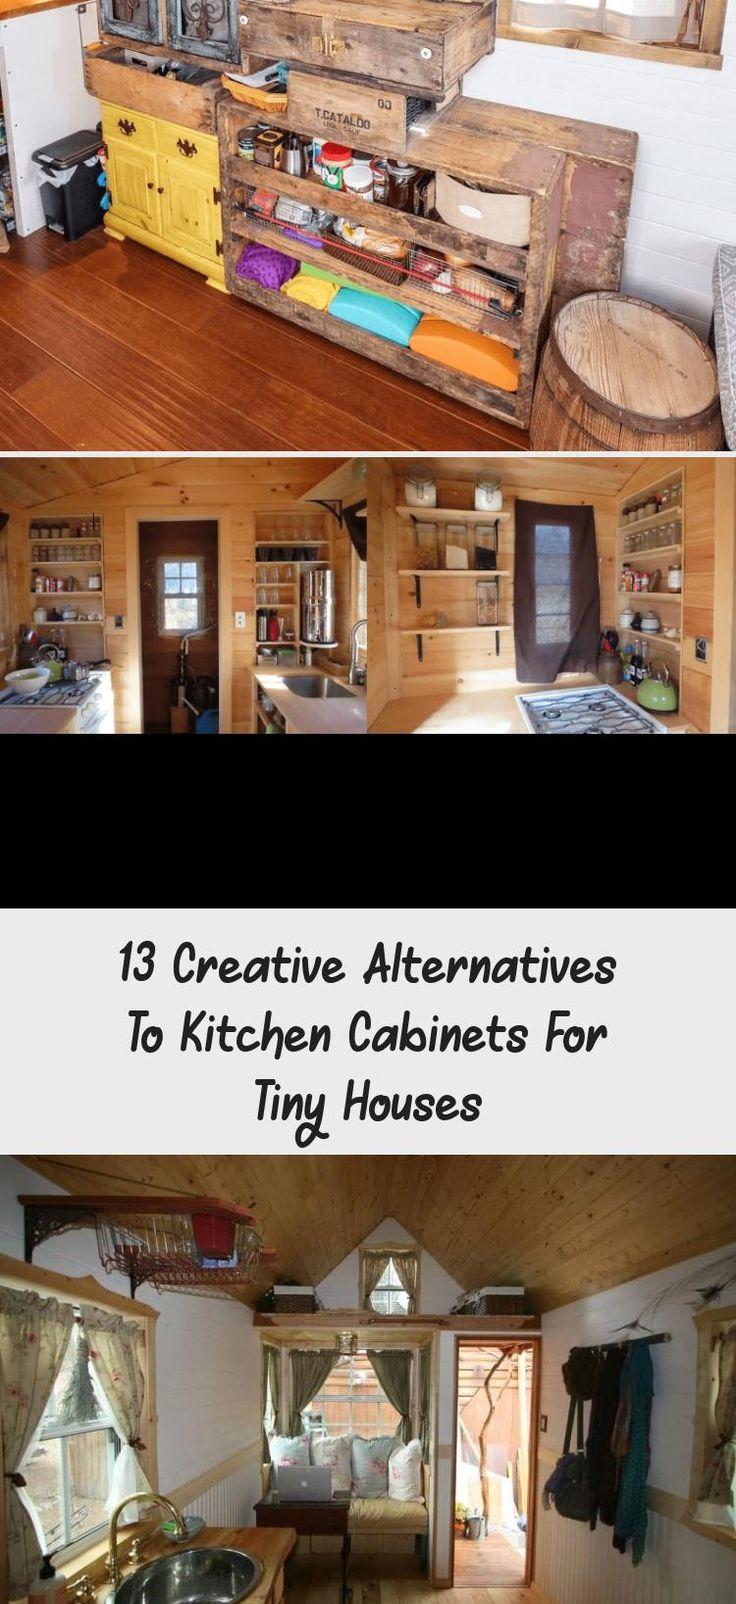 Kitchen for Tiny Houses 13 Alternative Designs